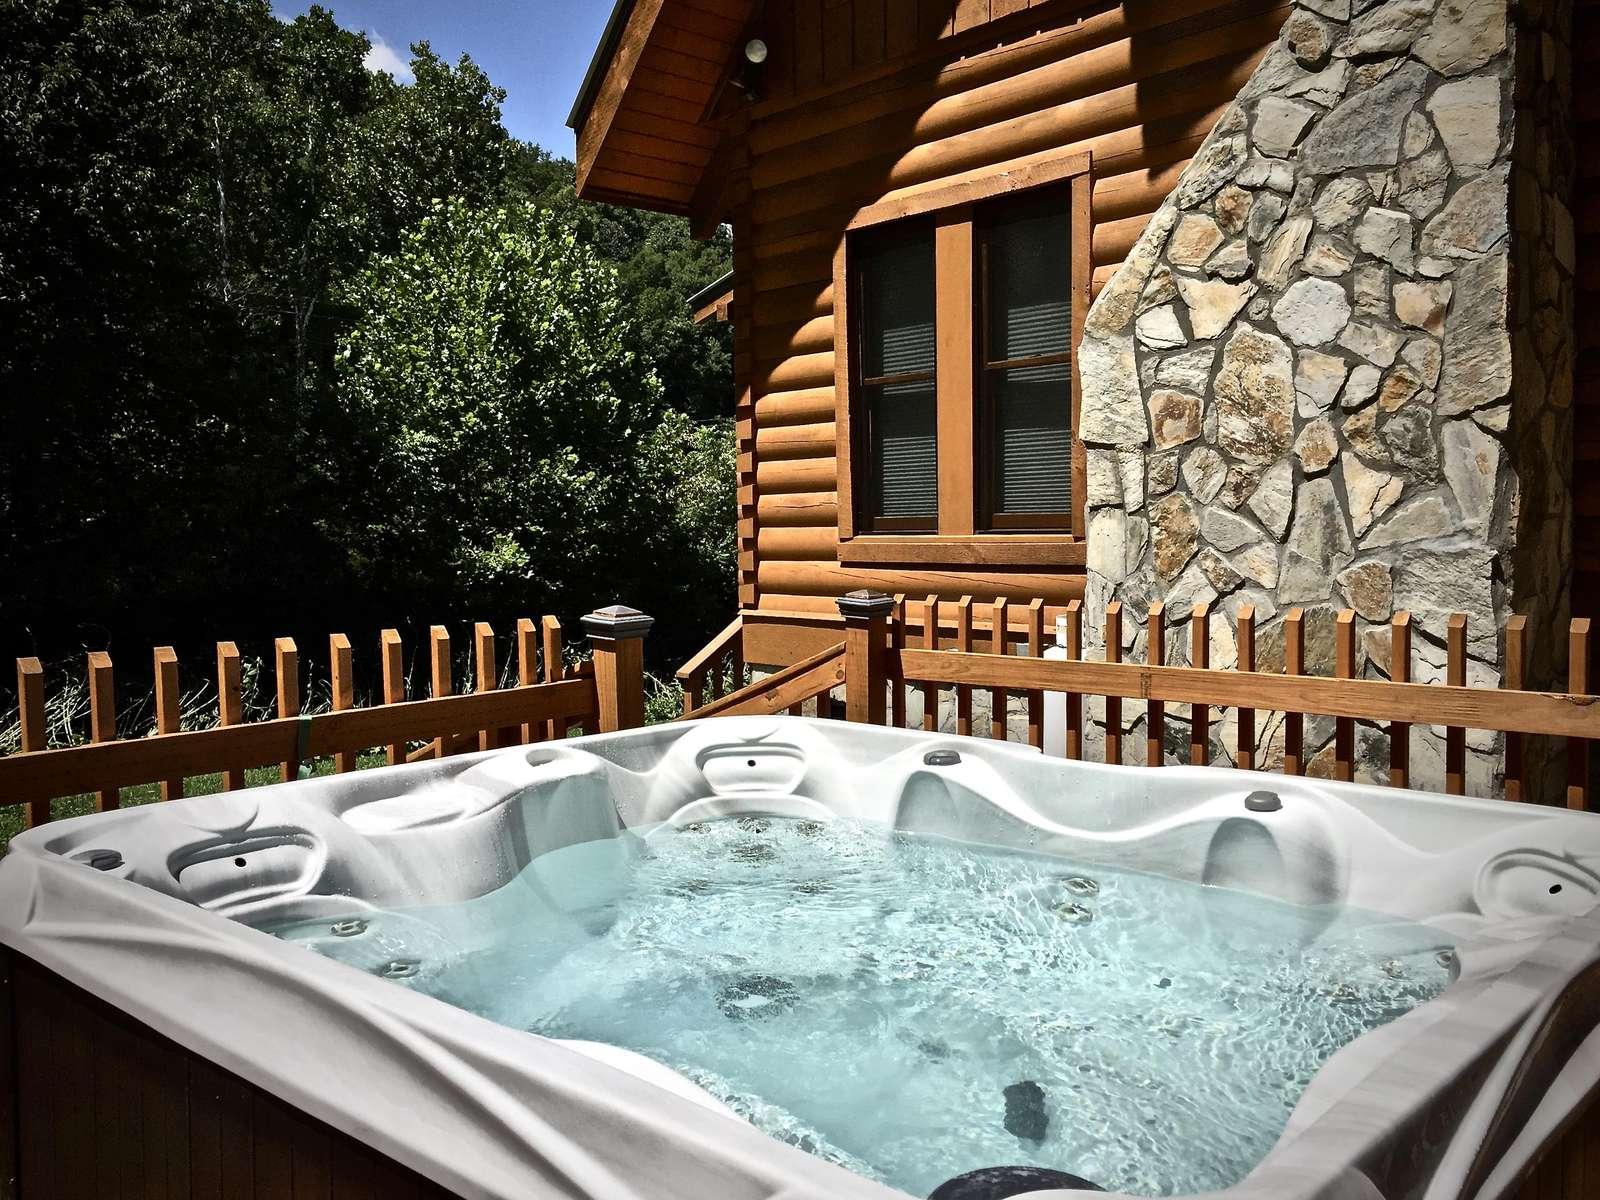 Sparkling Hot Tub awaits...